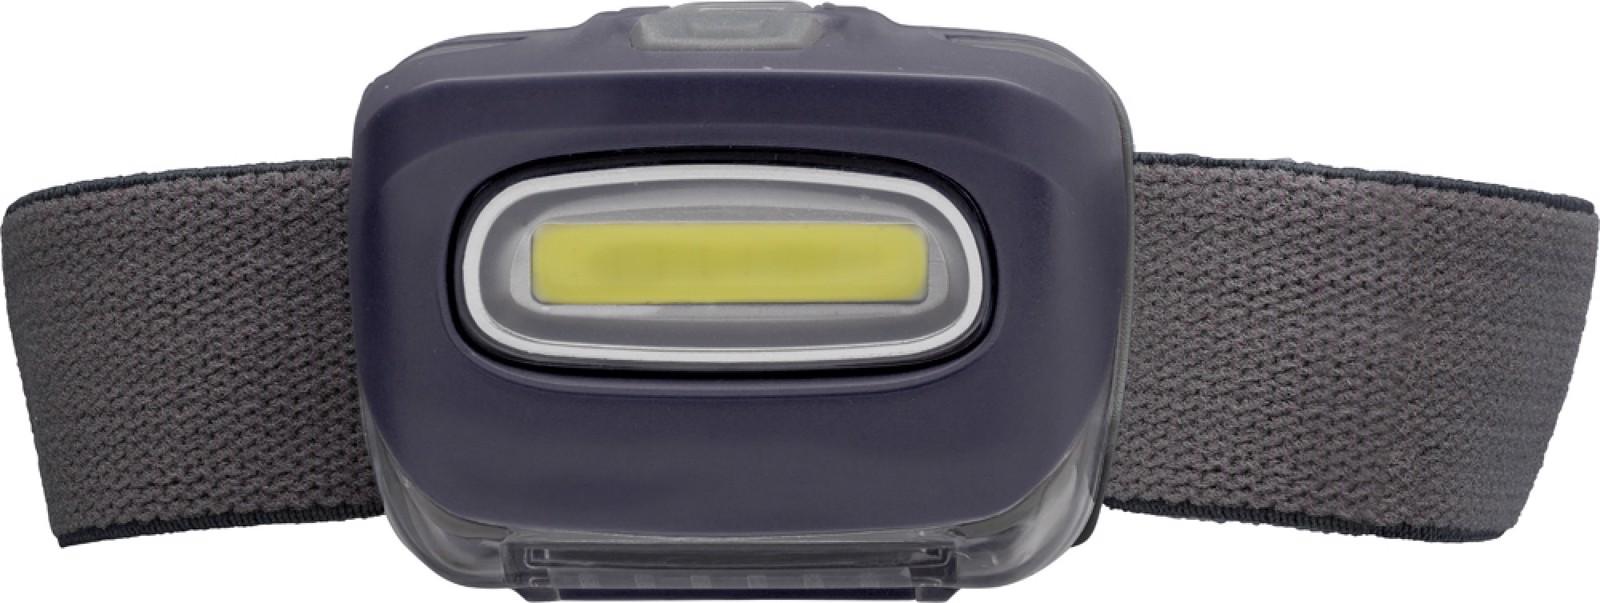 ABS head light - Black